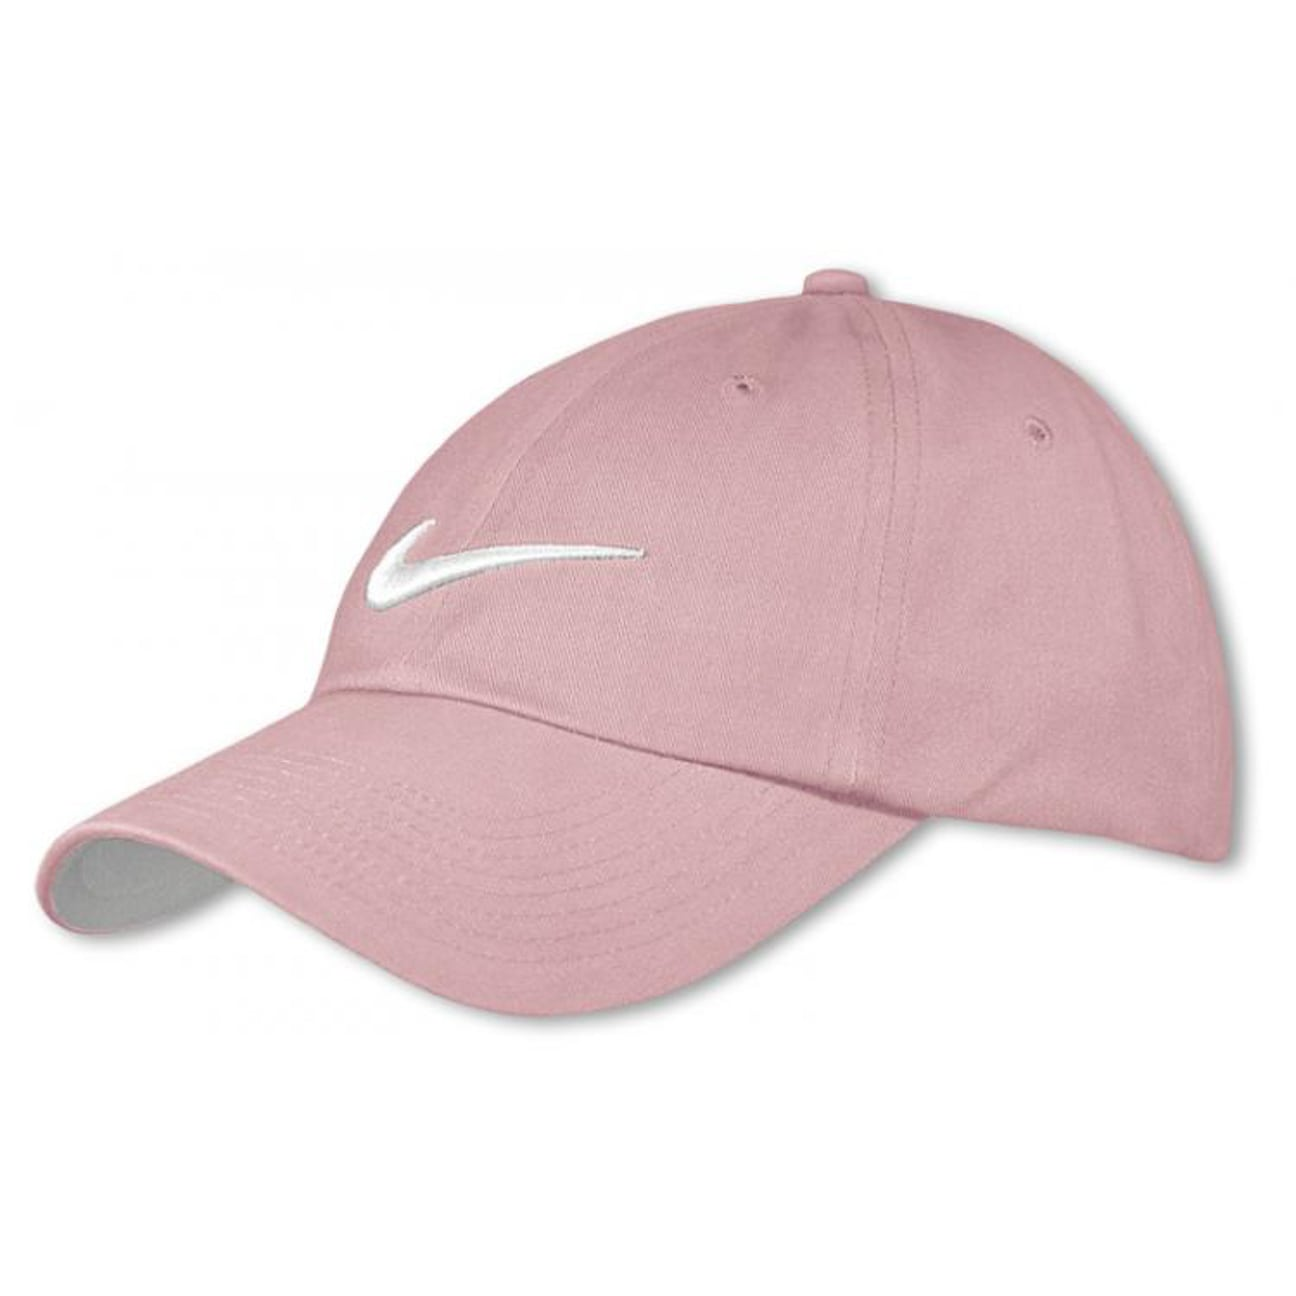 Exceptionnel casquette nike rose femme,casquette nike rose femme logo en metal OI45